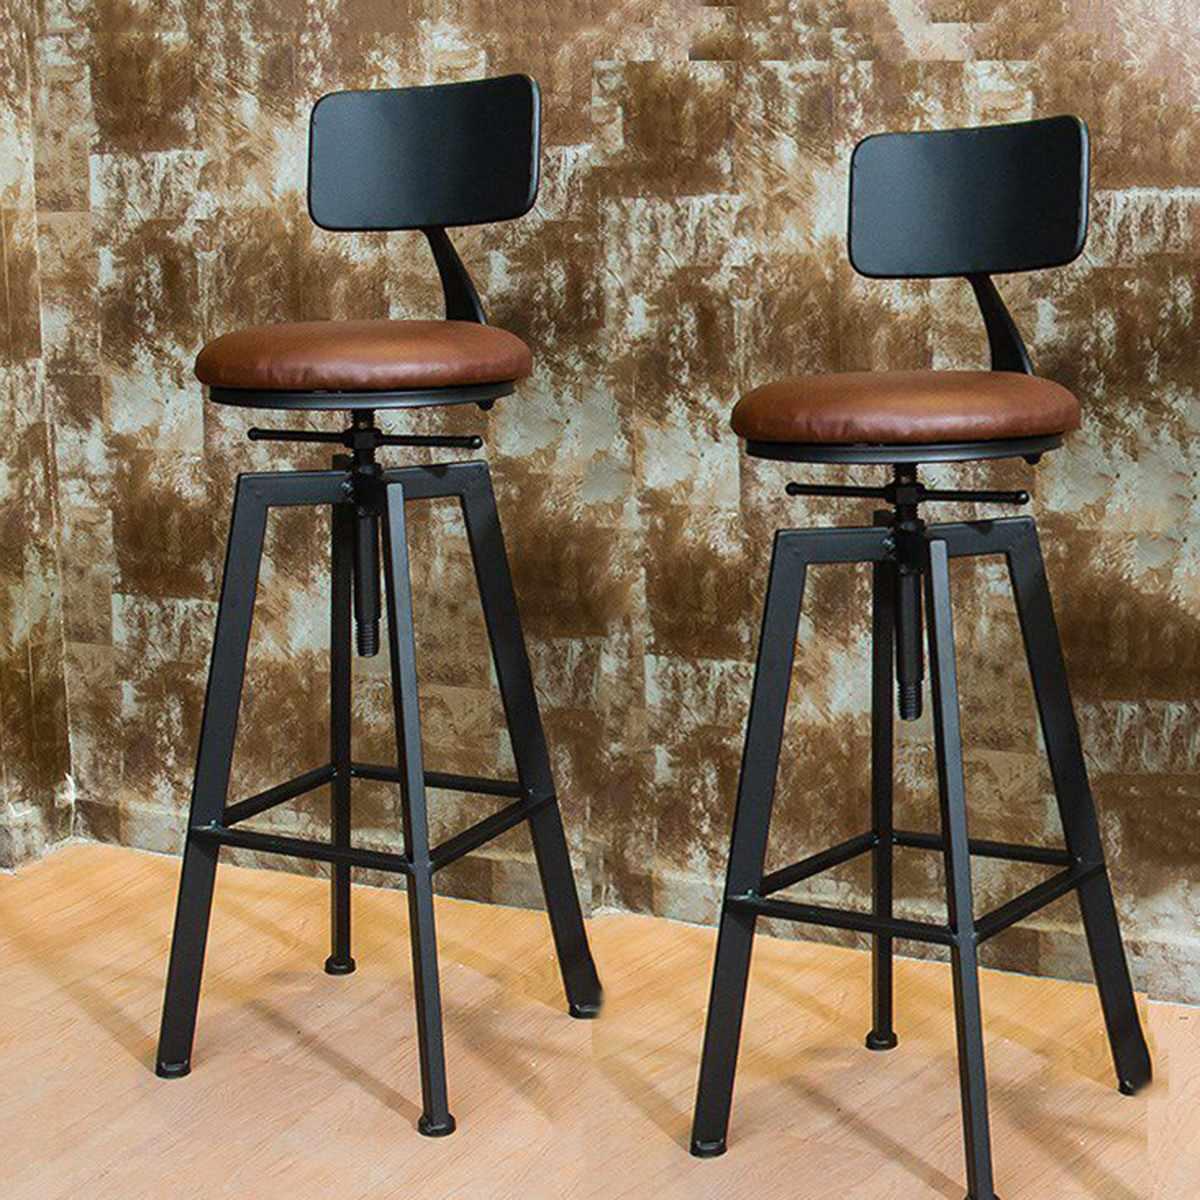 Adjustable VINTAGE RETRO LOOK RUSTIC KITCHEN BAR STOOL CAFE ...